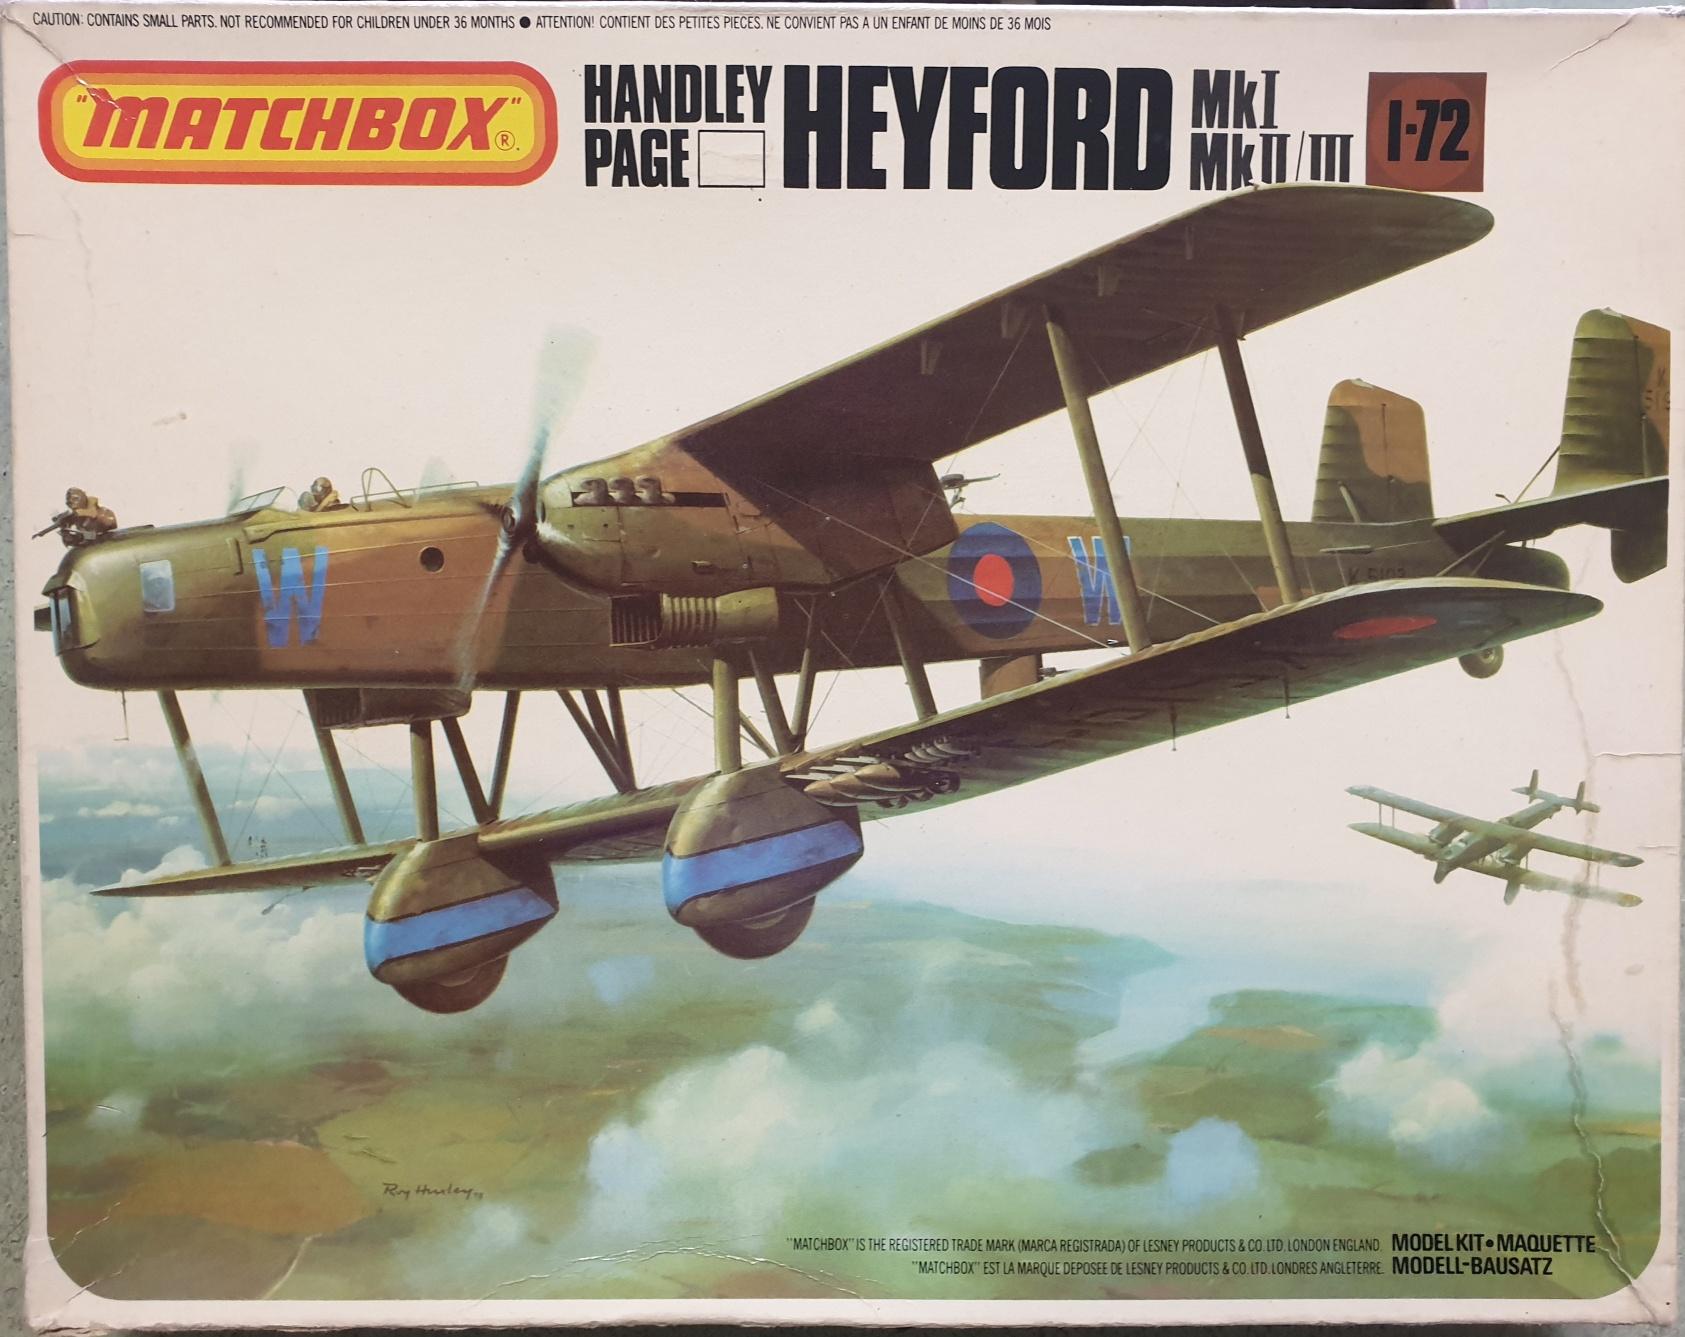 2 Matchbox PK-605 Handley Page Heyford